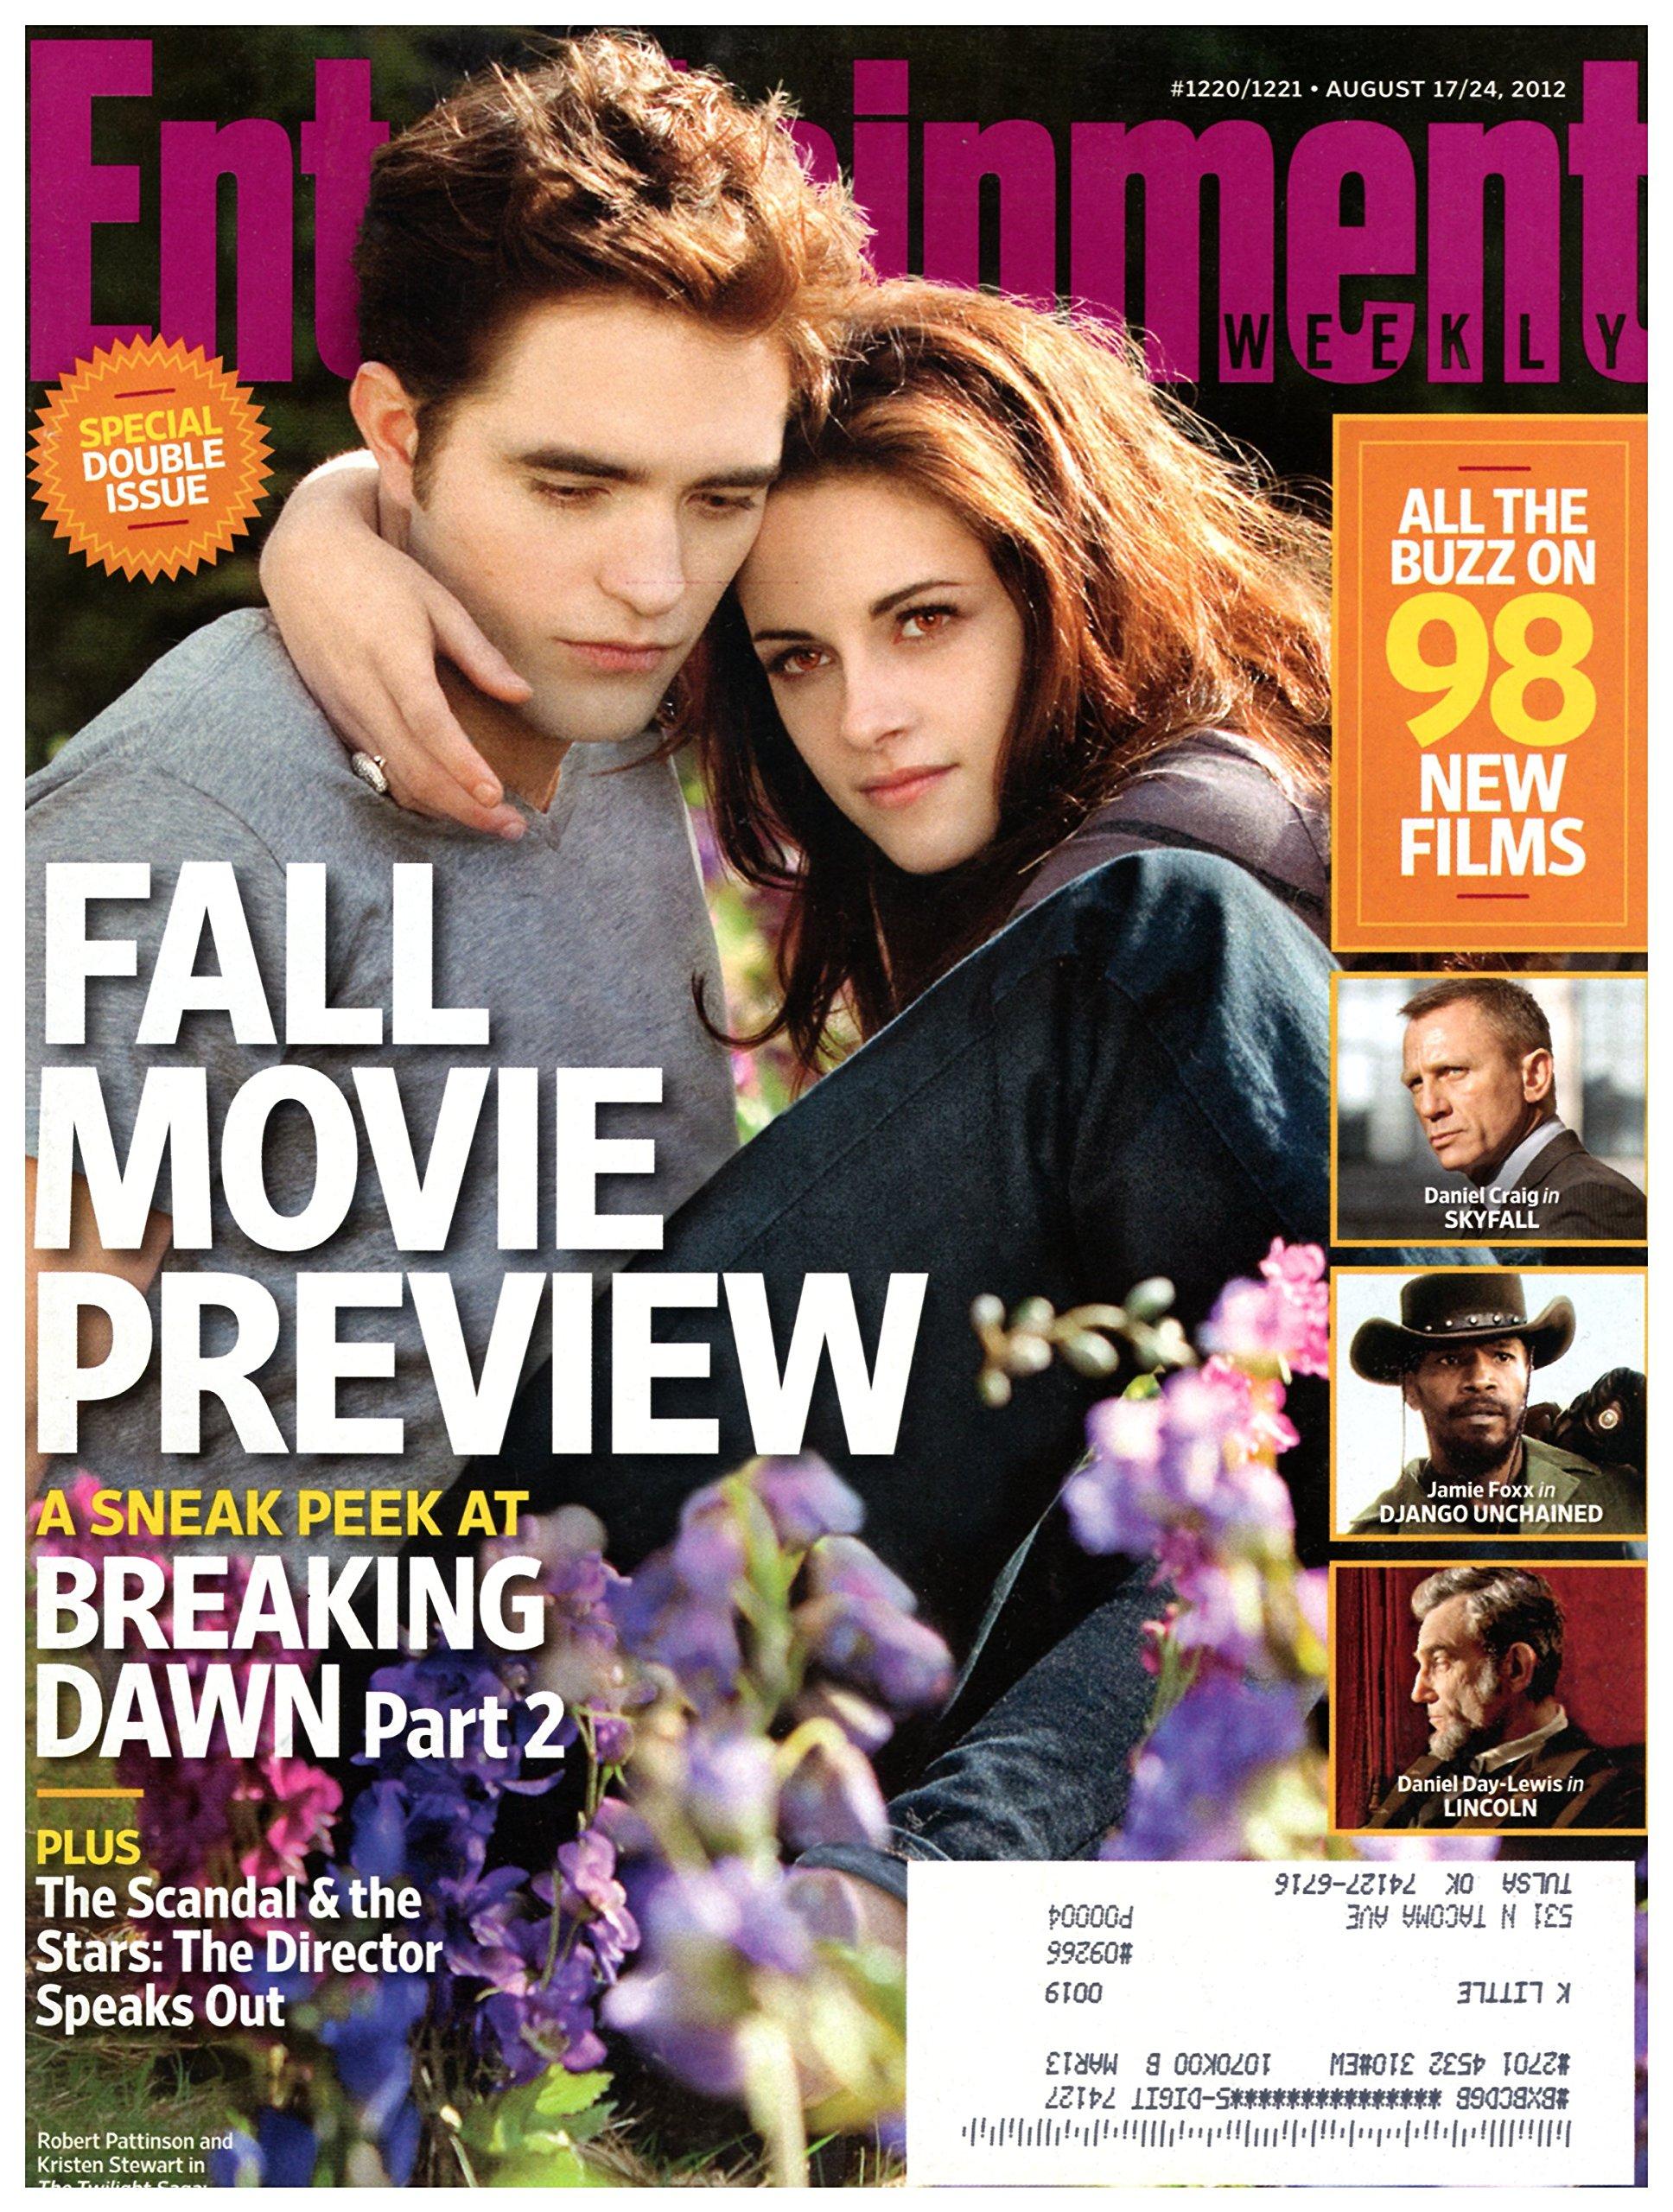 Rob Pattinson i Kristen Stewart z 2012 roku